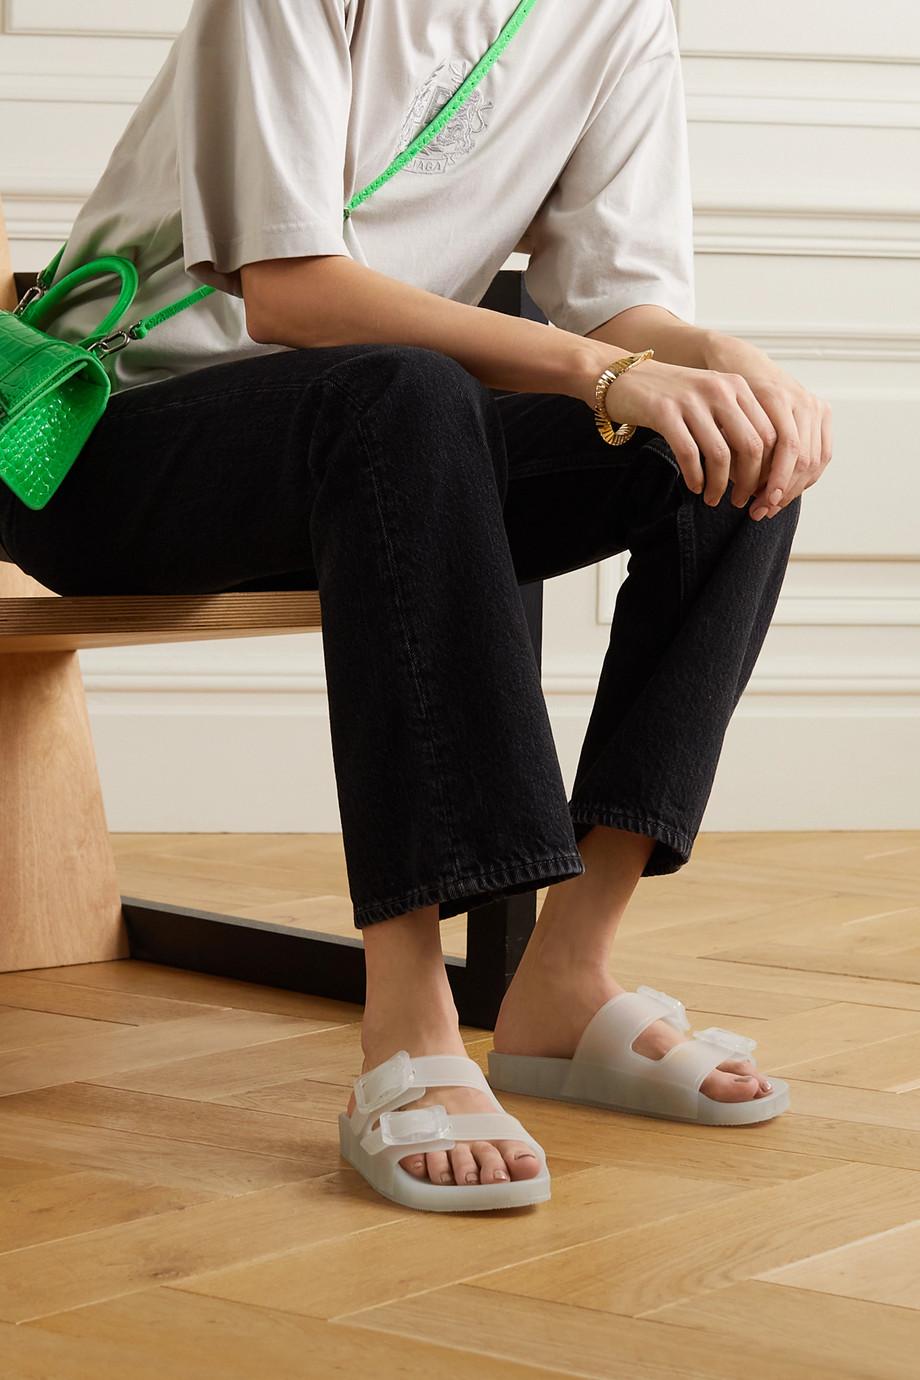 Balenciaga Mallorca Pantoletten aus Gummi